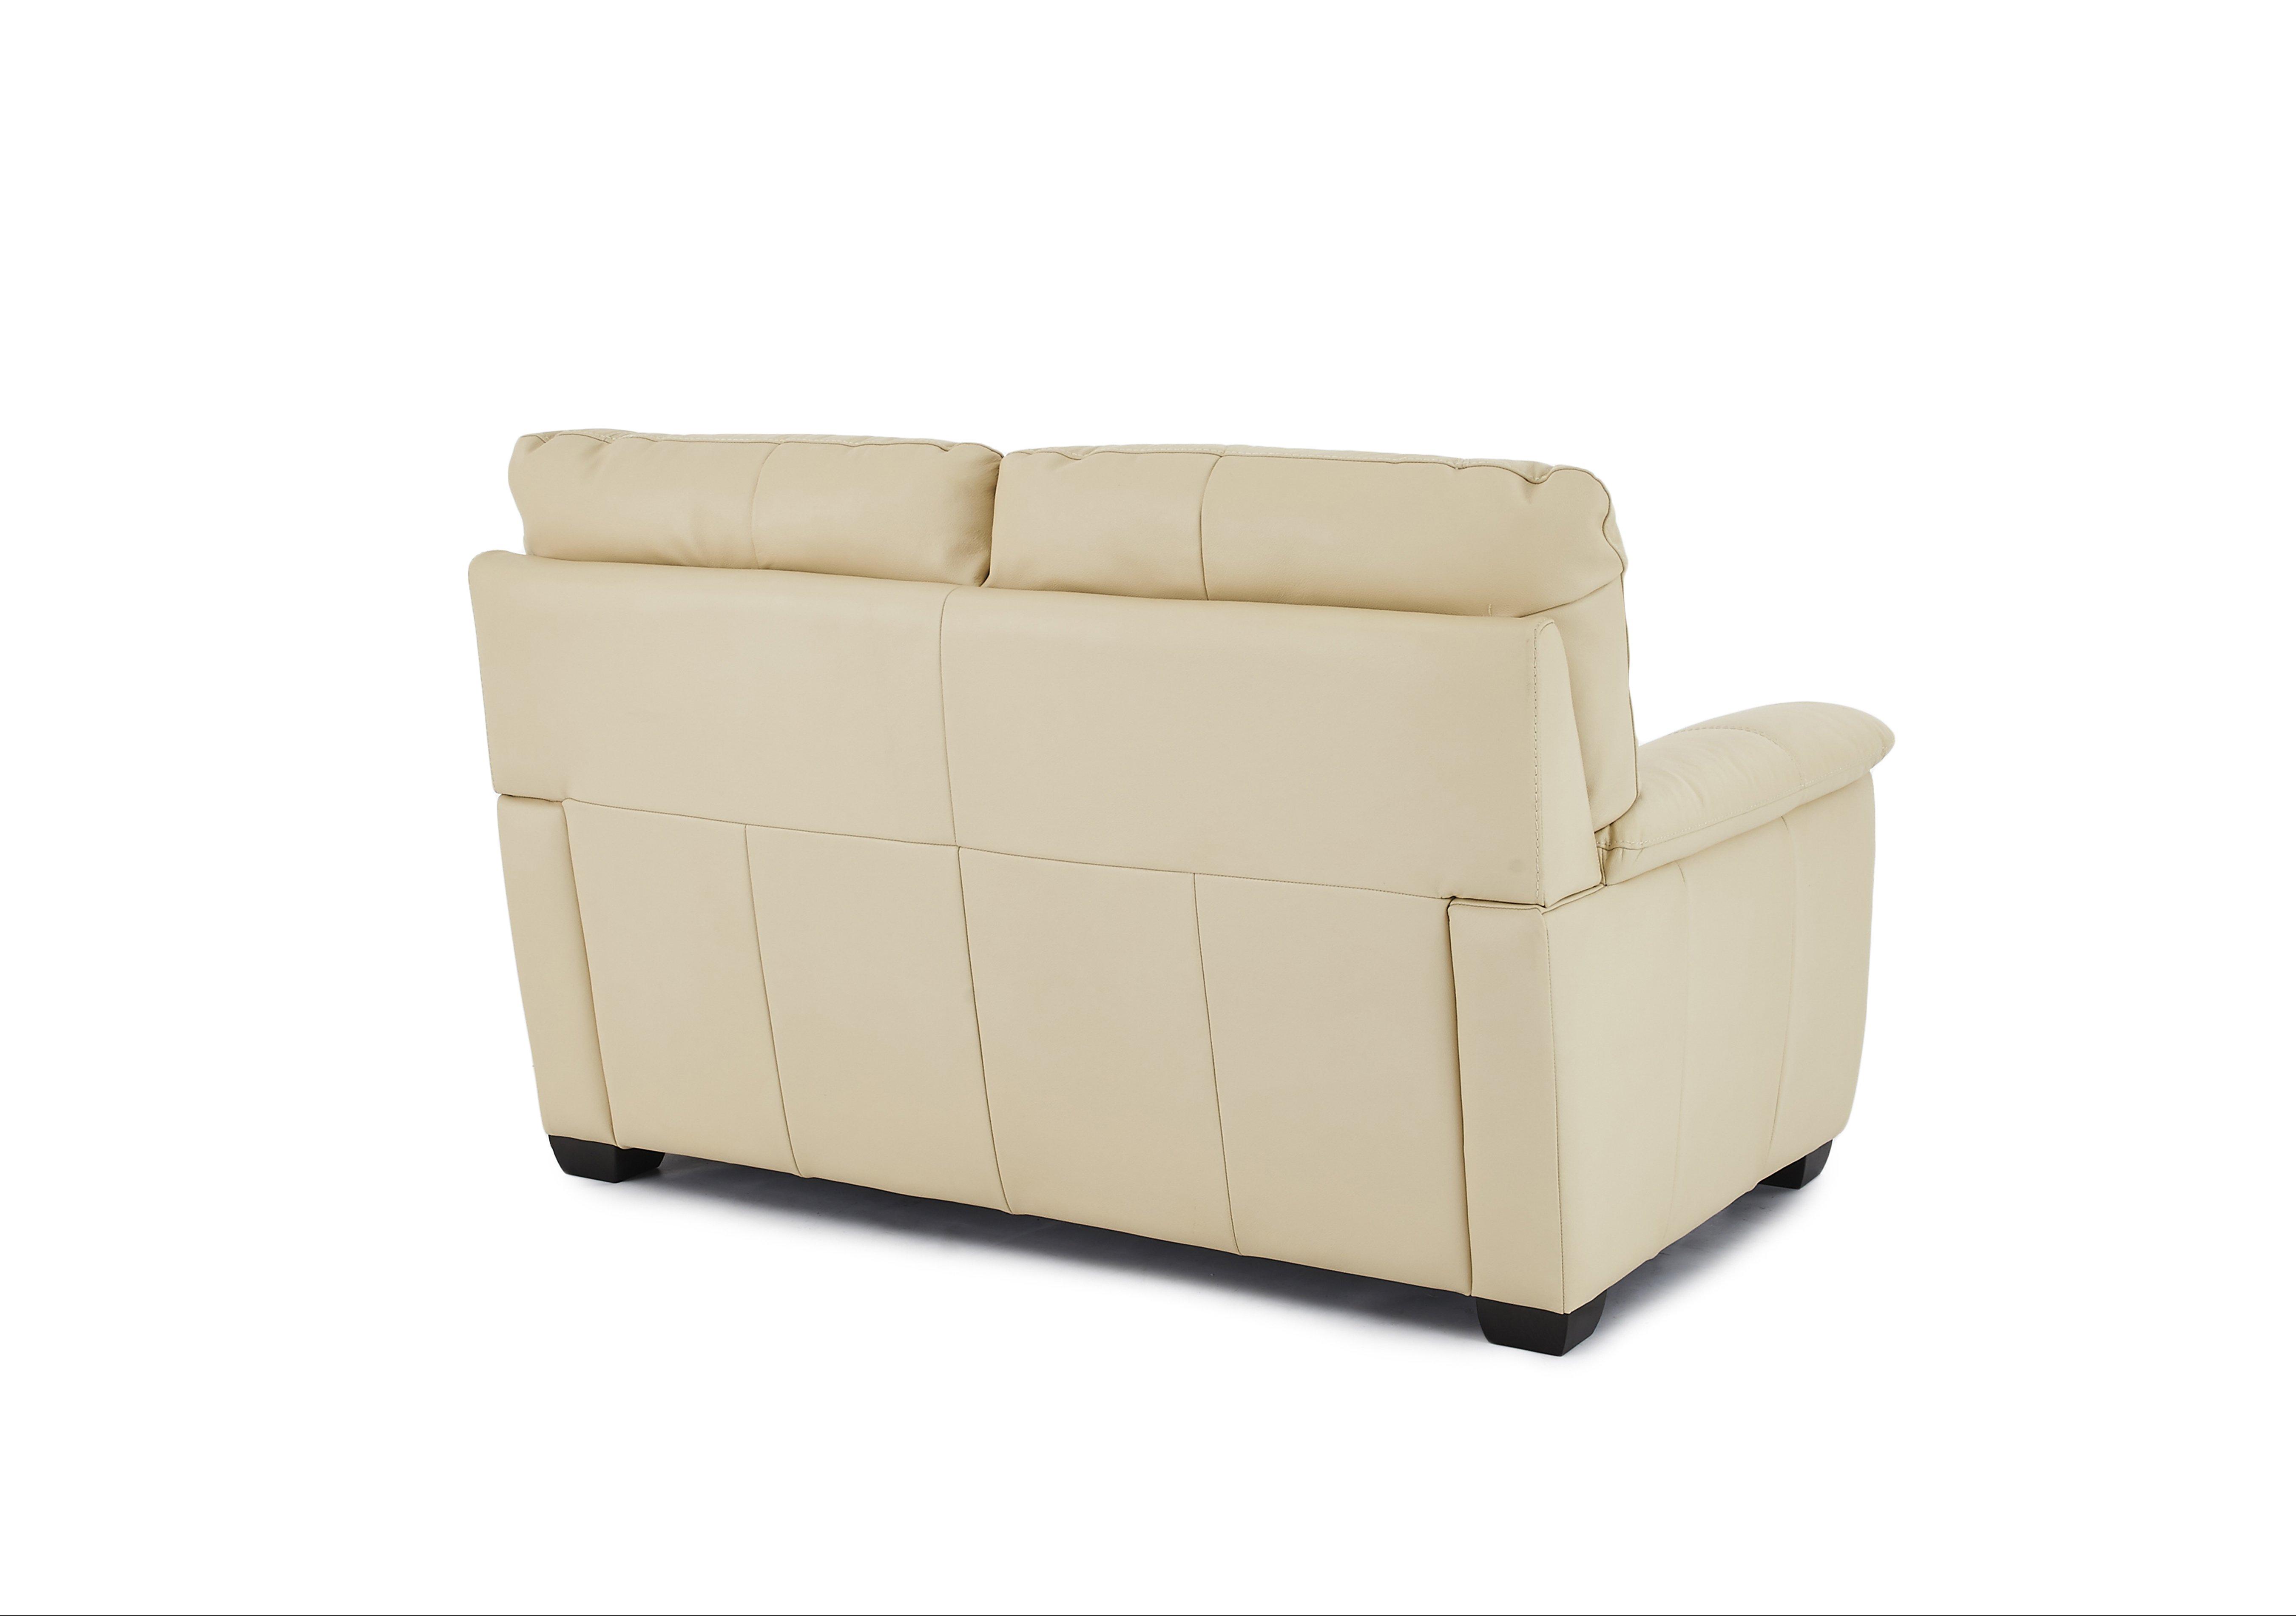 Apollo 2 Seater Leather Sofa Furniture Village